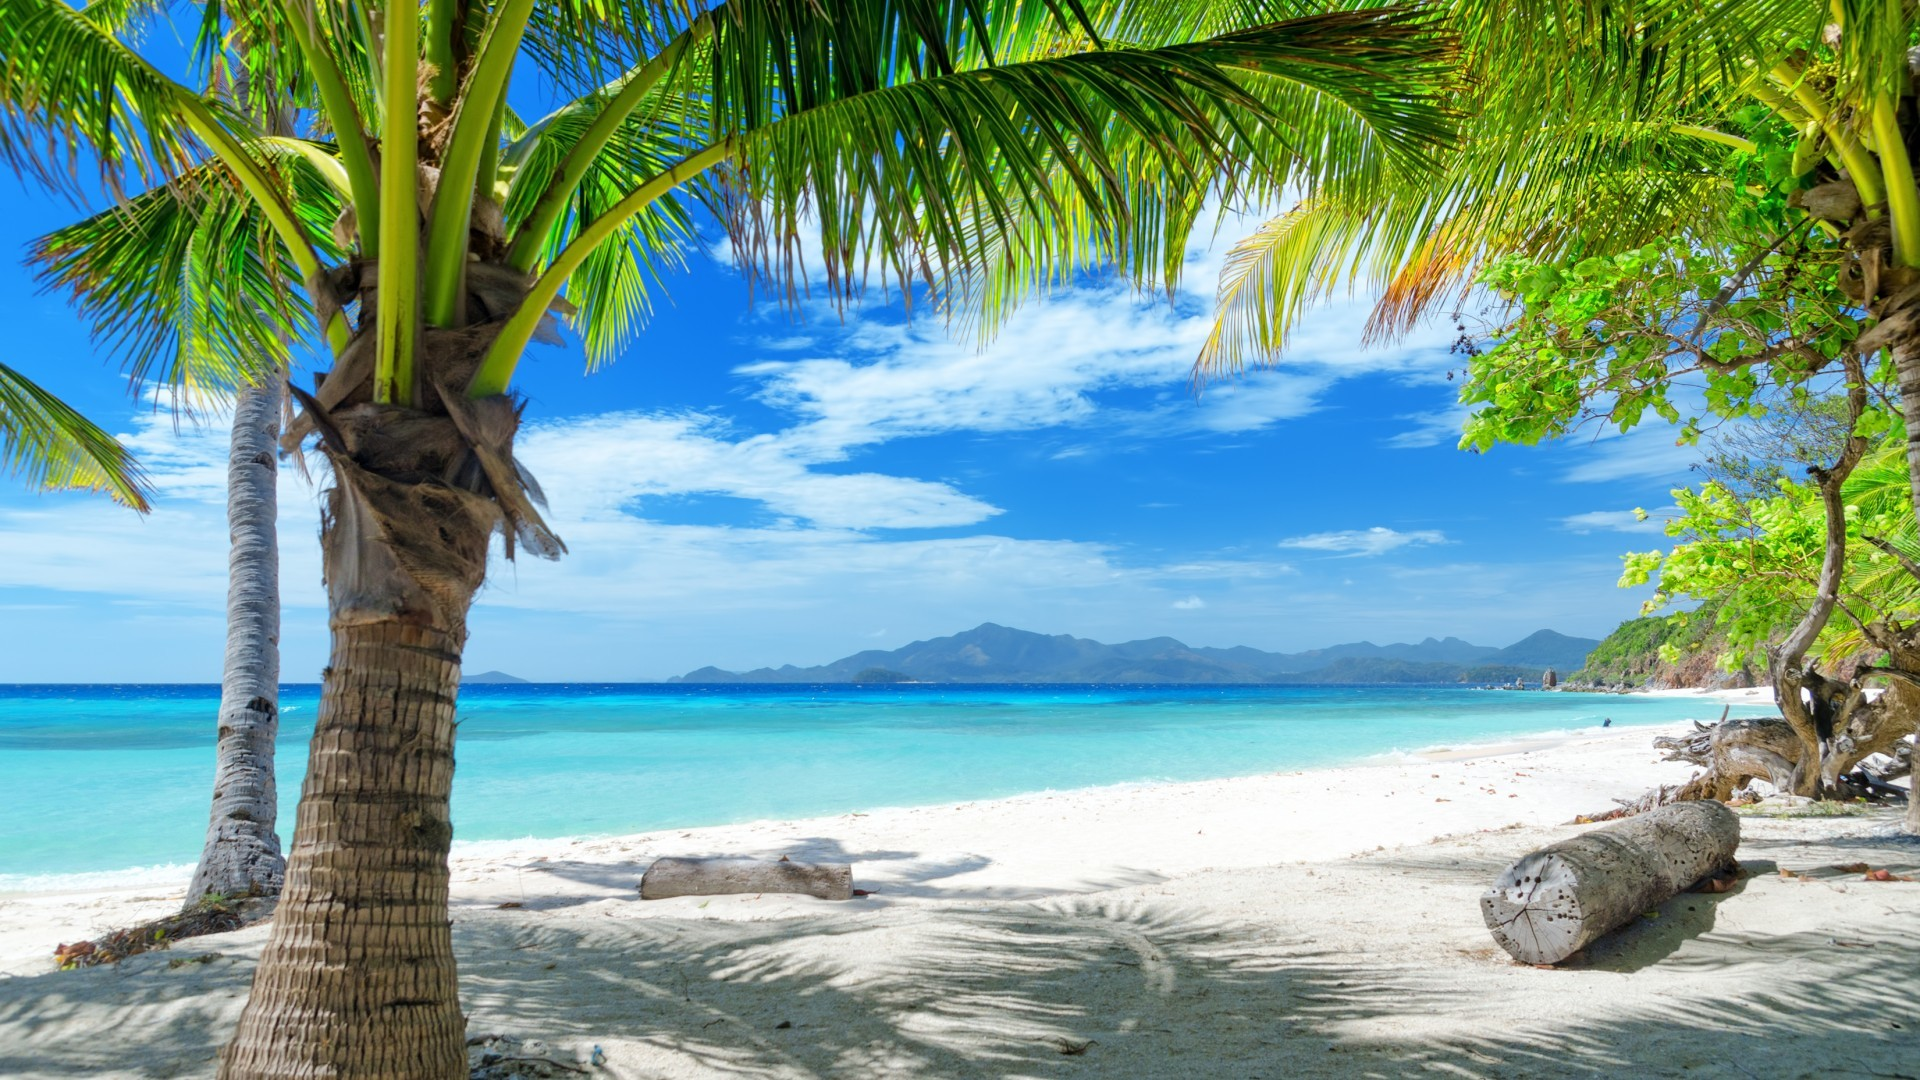 beach hd desktop background